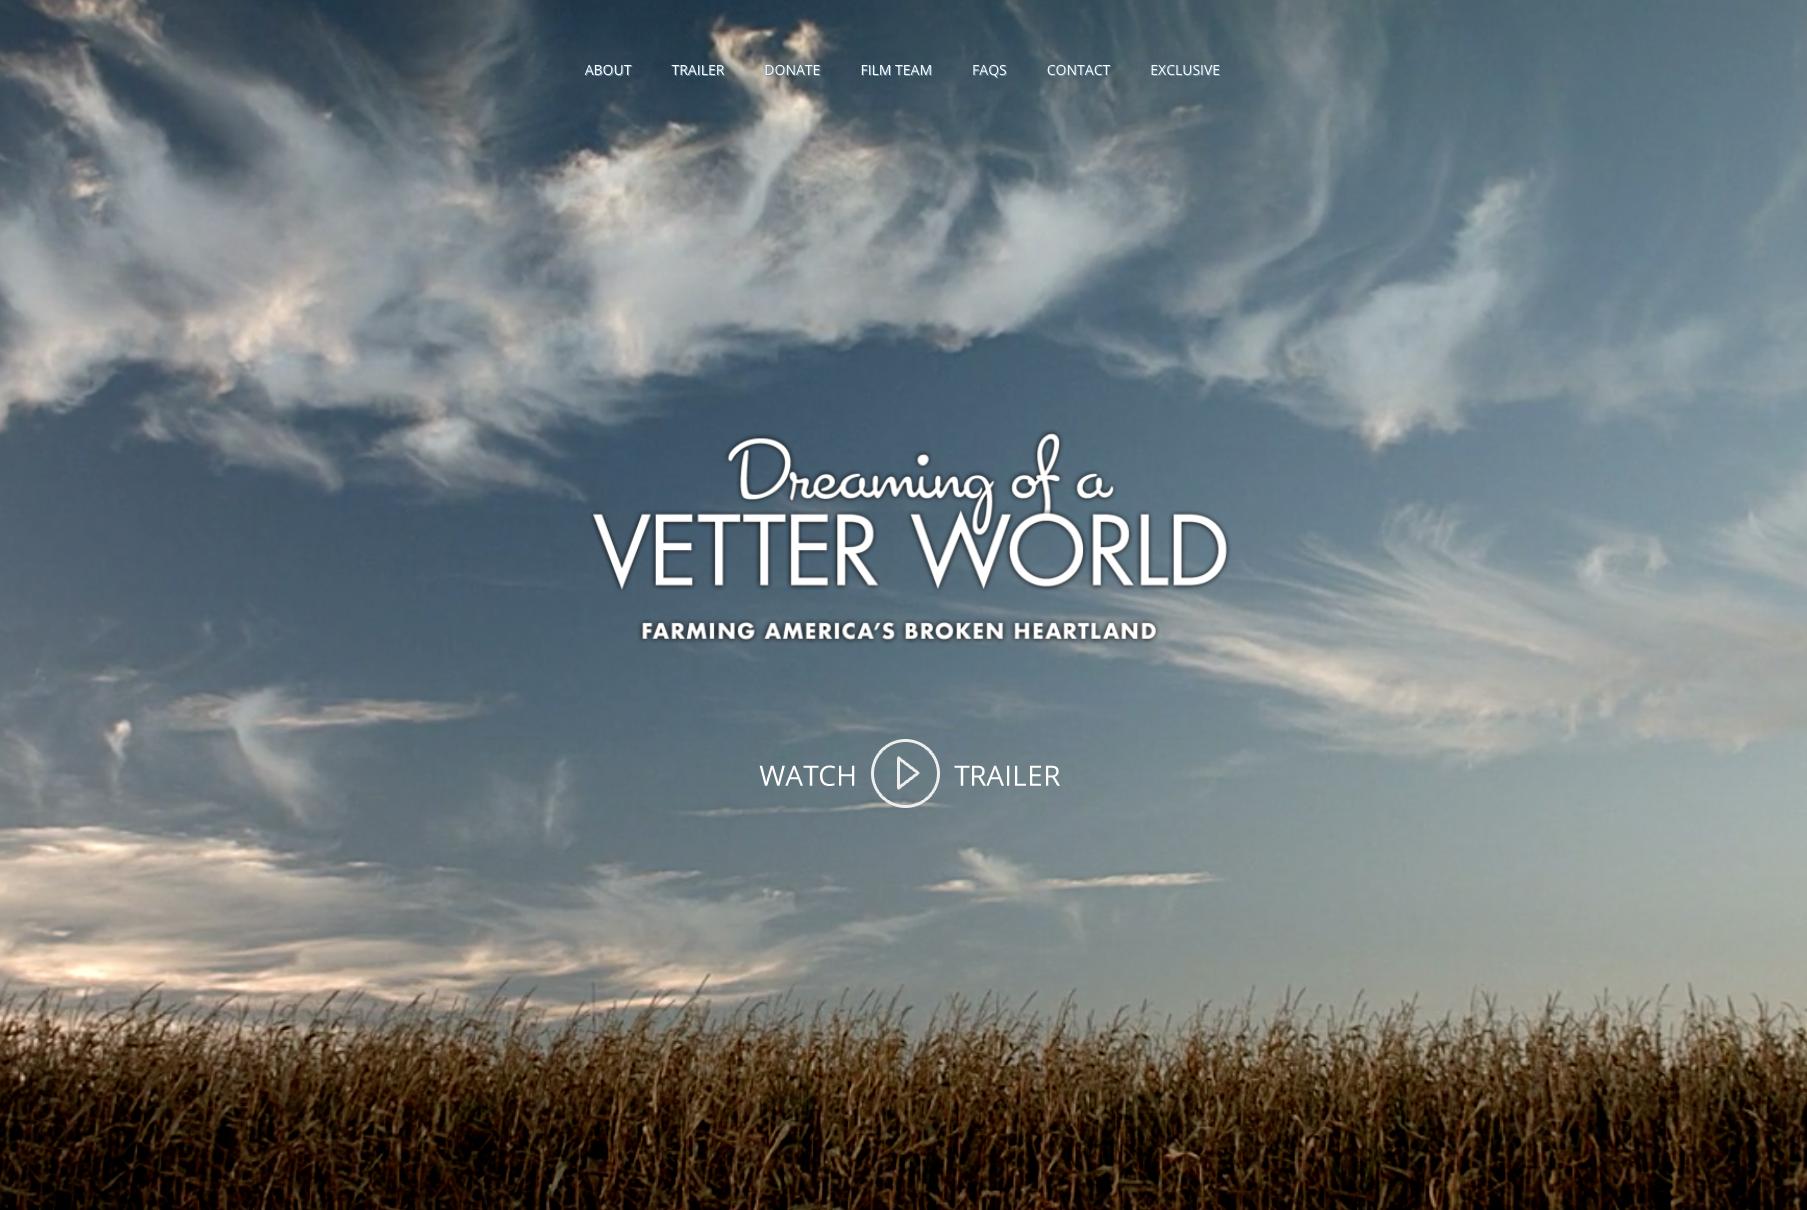 Dreaming of a Vetter World